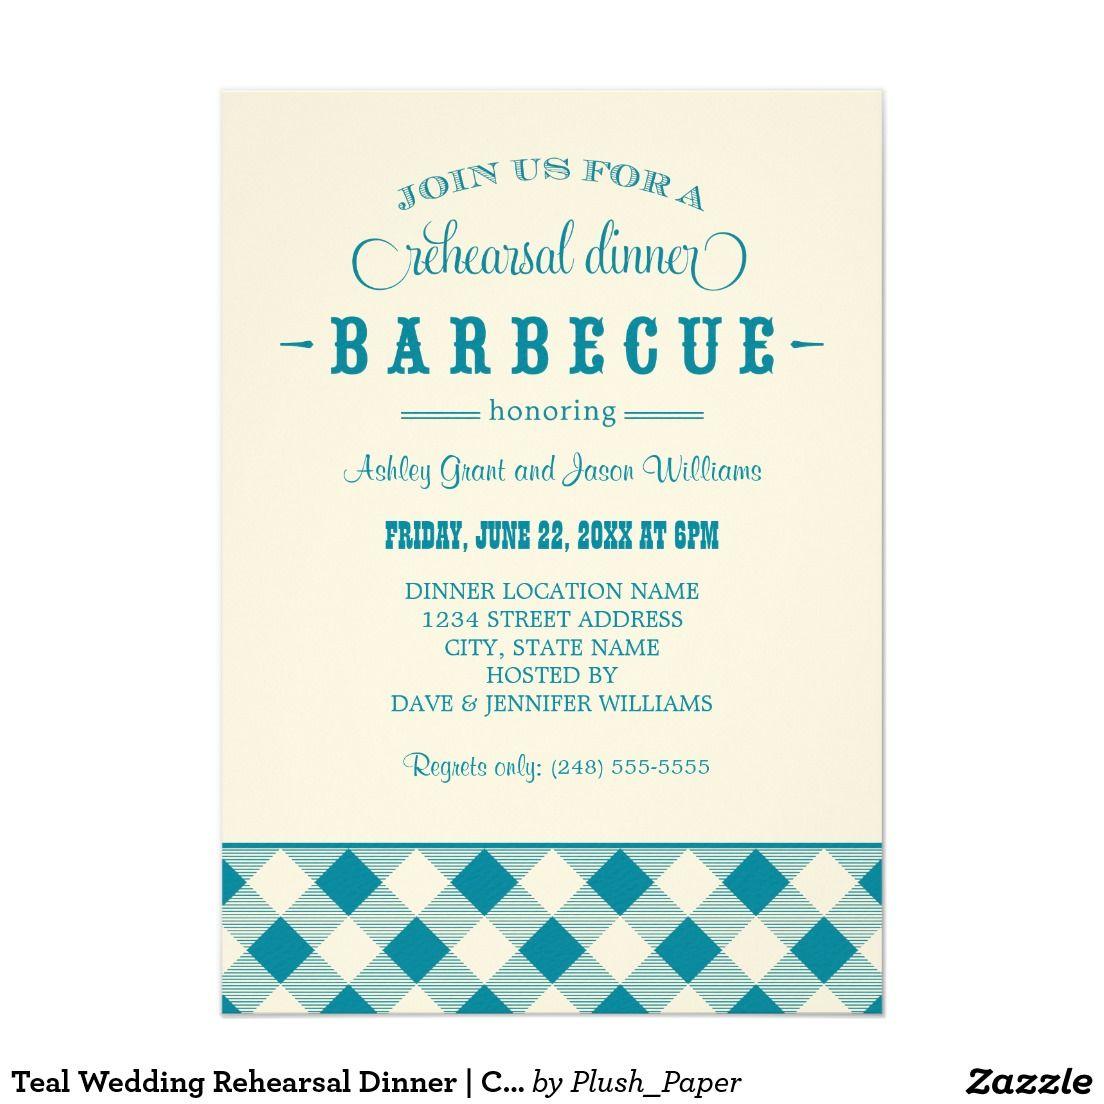 Teal Wedding Rehearsal Dinner | Casual BBQ | WEDDING REHEARSAL ...